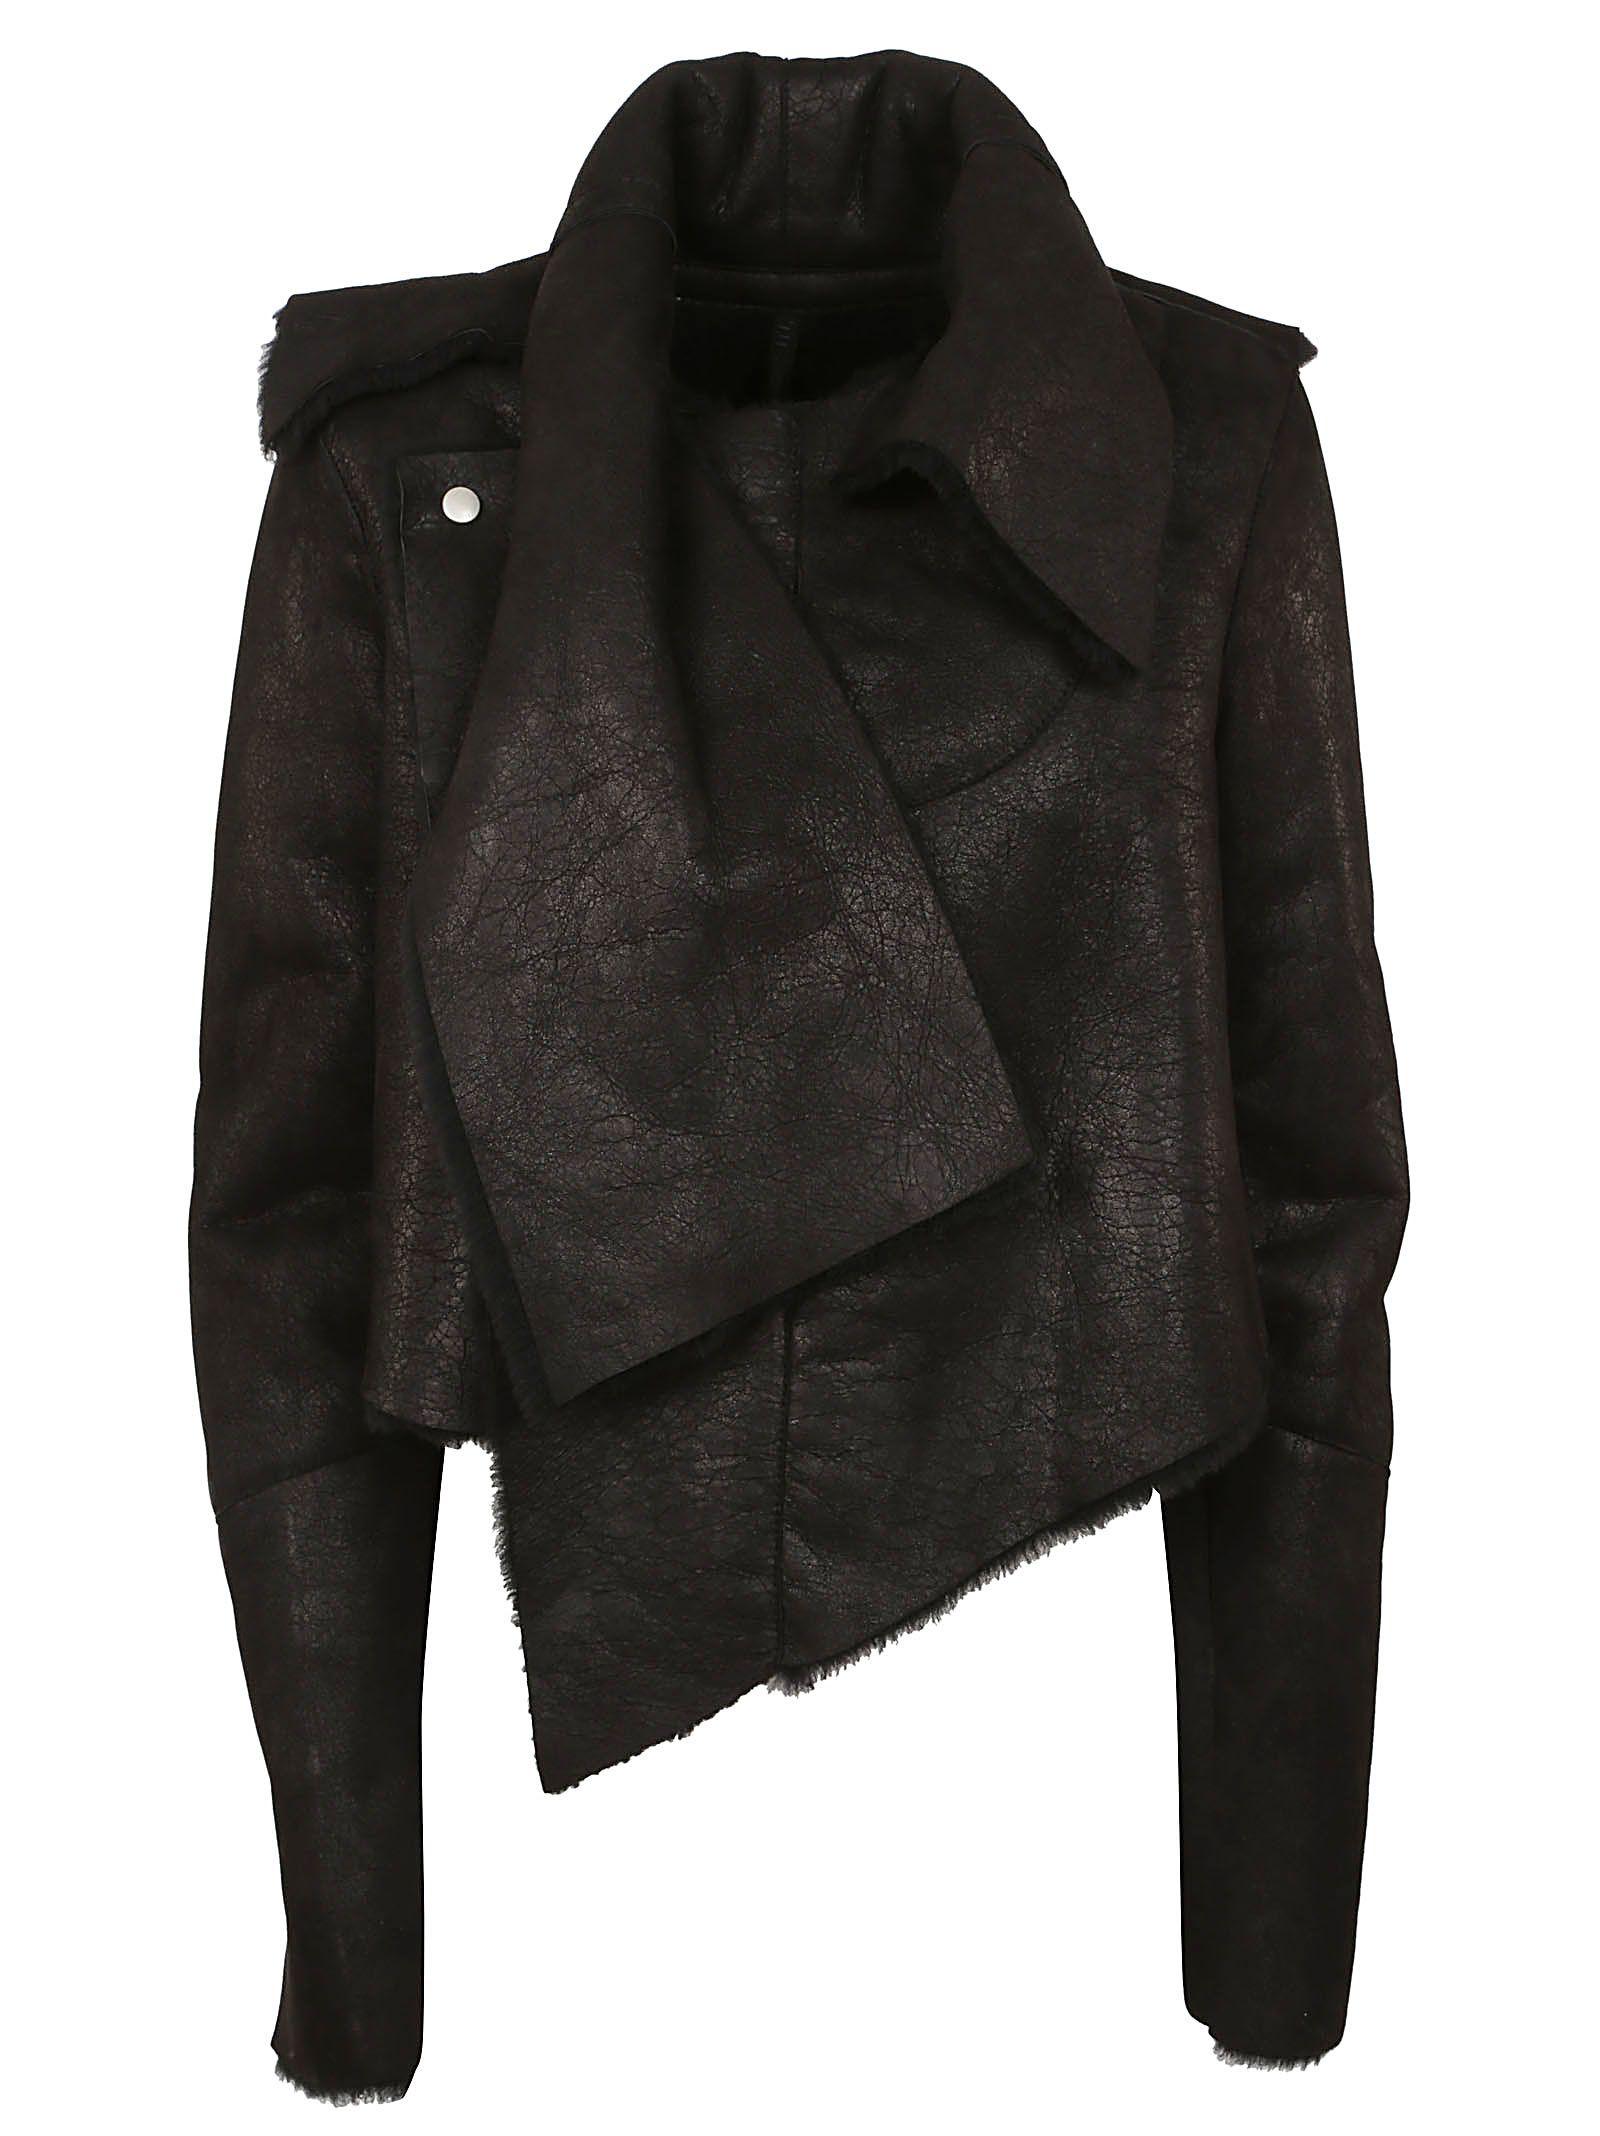 Ben Taverniti Unravel Project Deconstructed Jacket